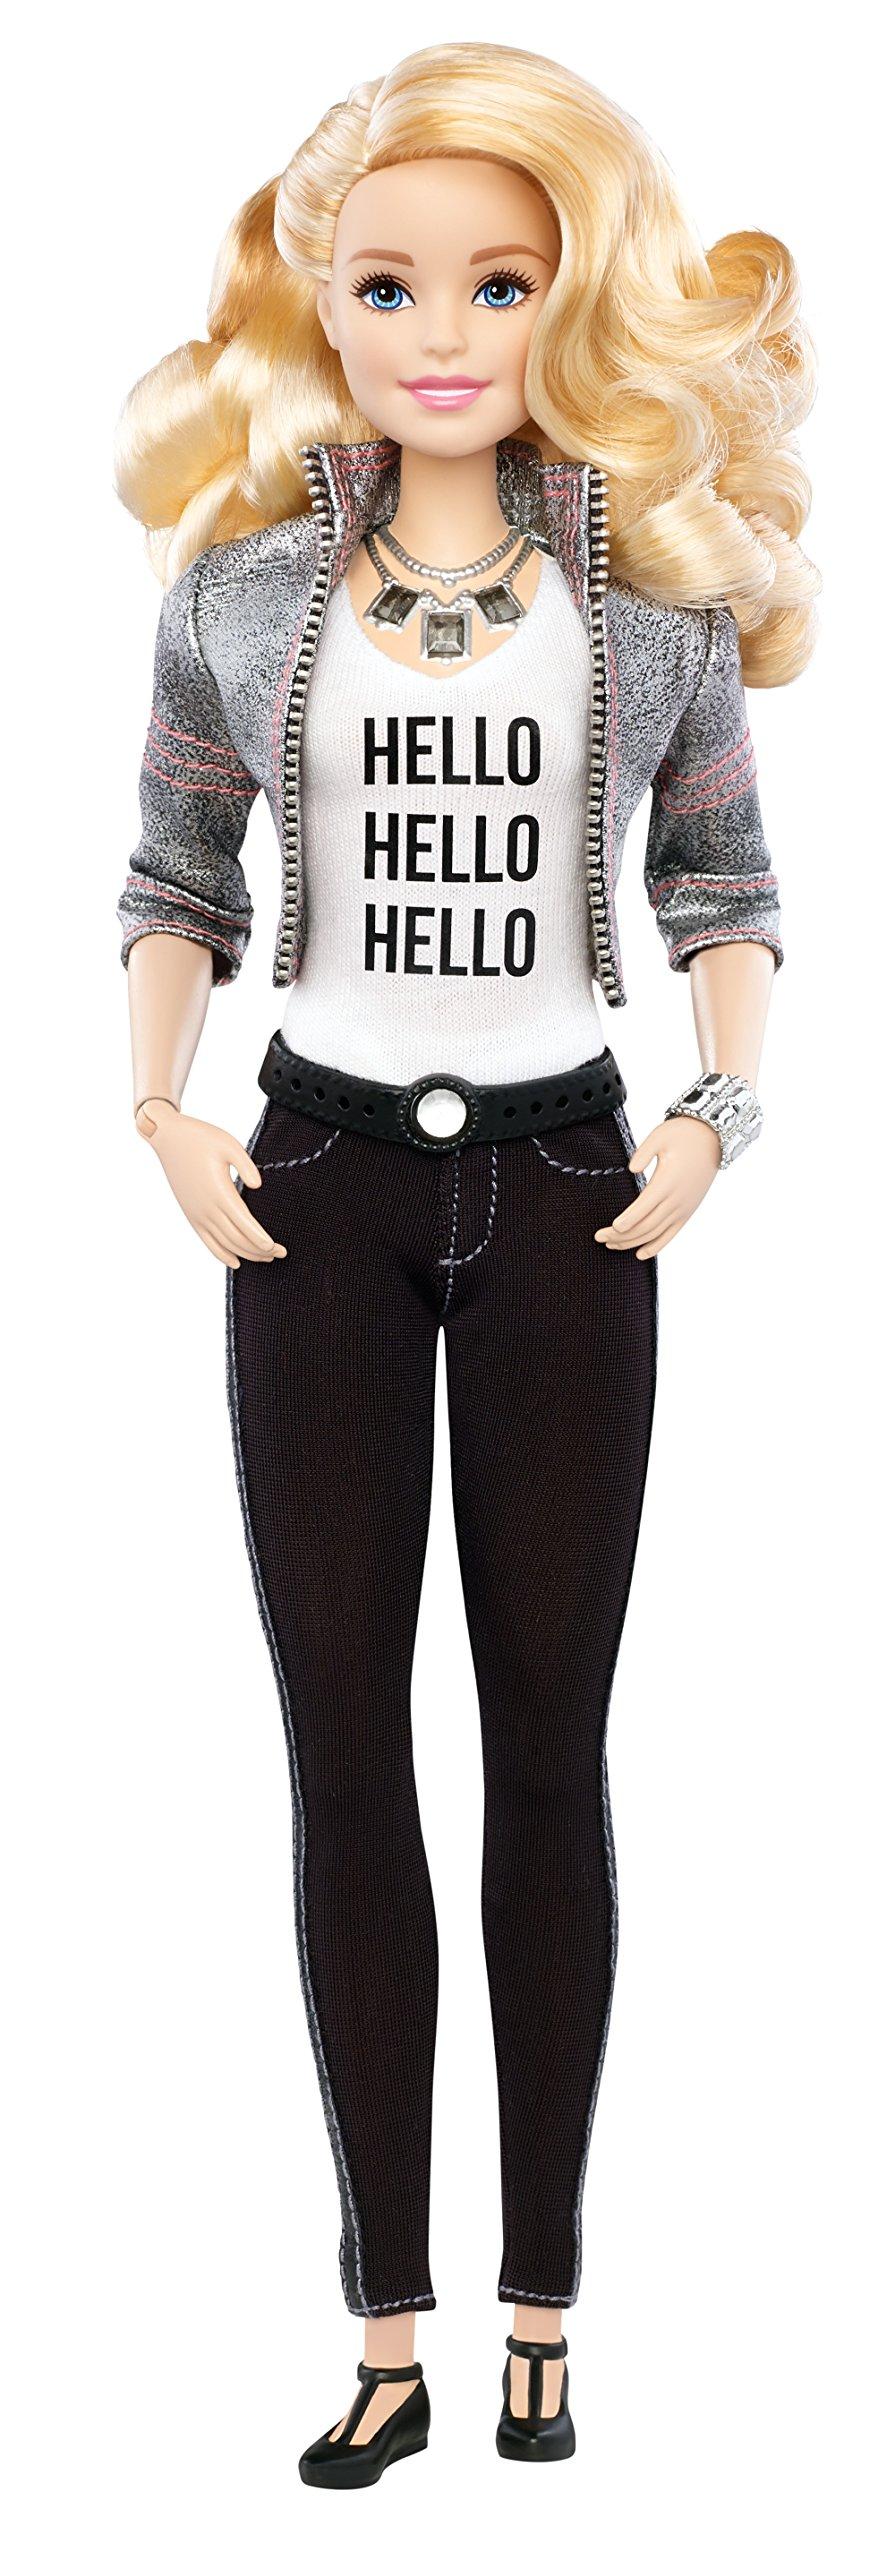 Barbie Hello Barbie Doll